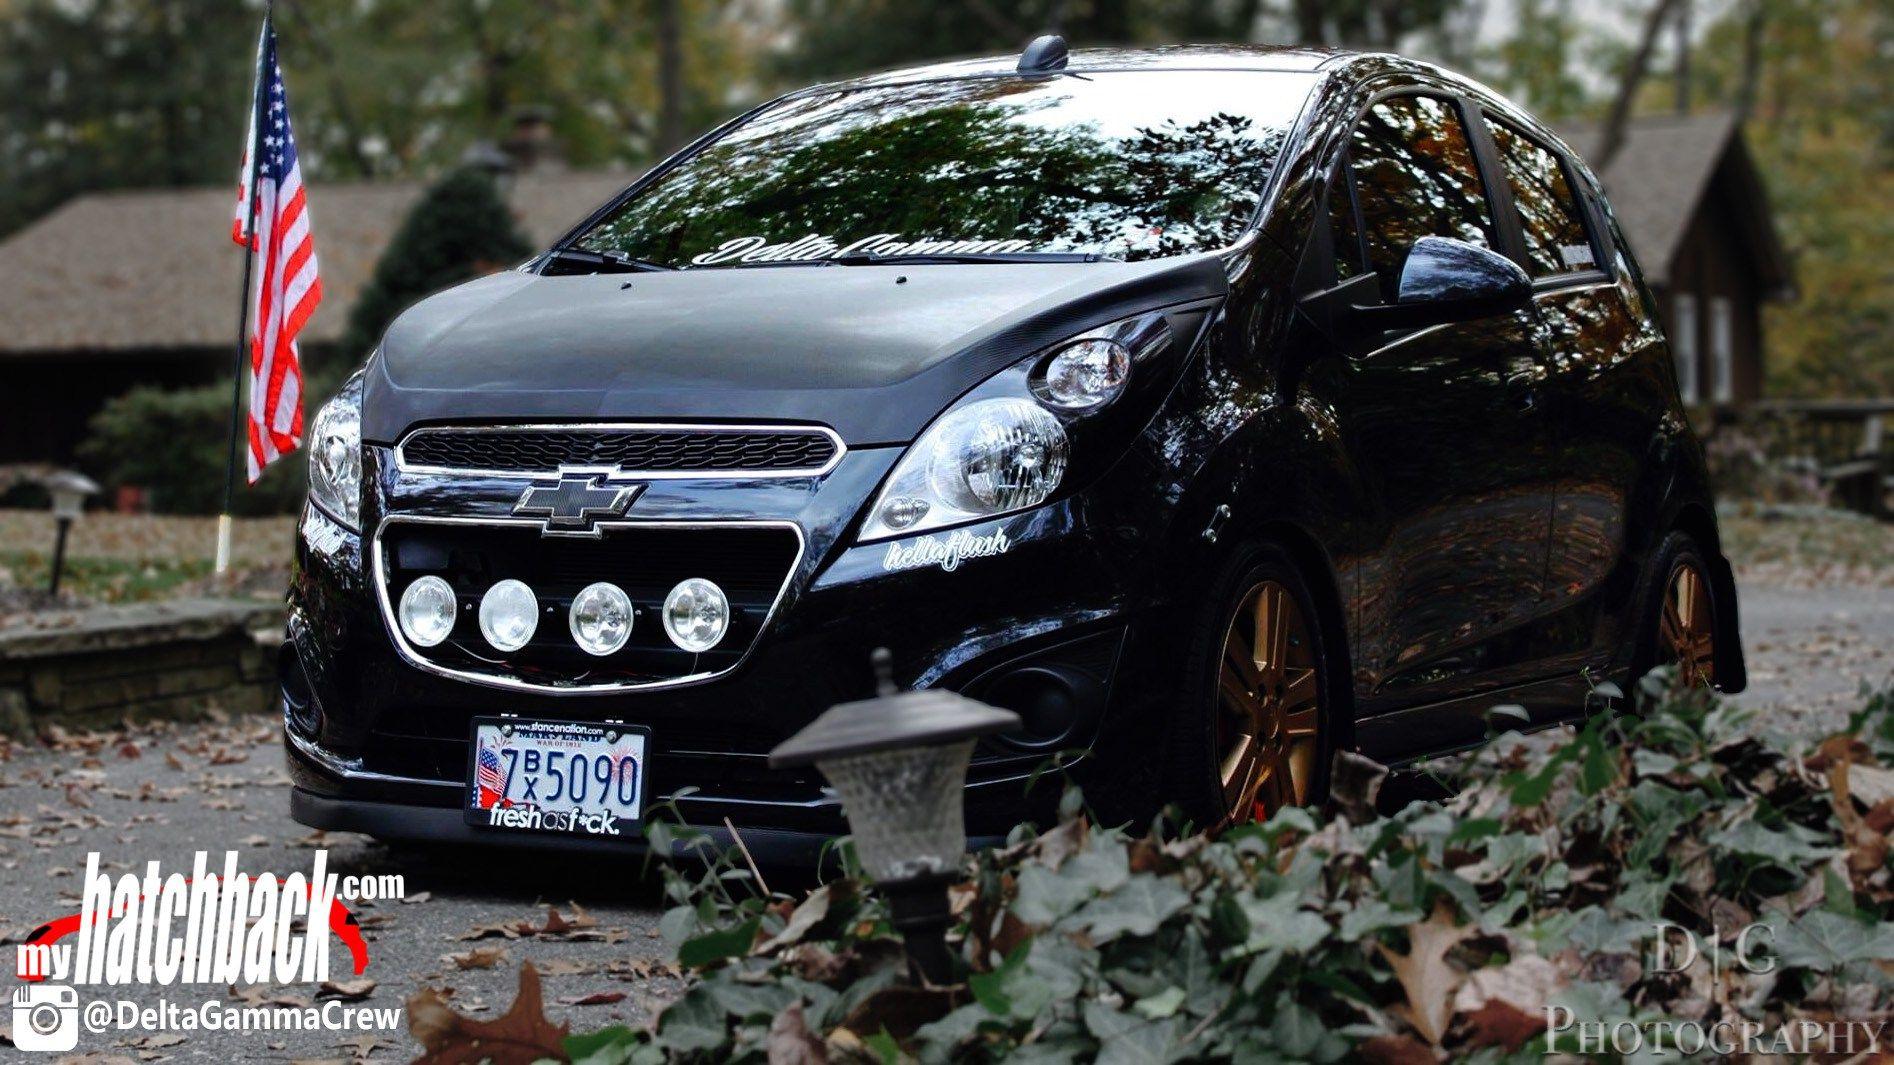 Leonides 2015 Chevy Spark Hatchback Aka Warbunny Autos